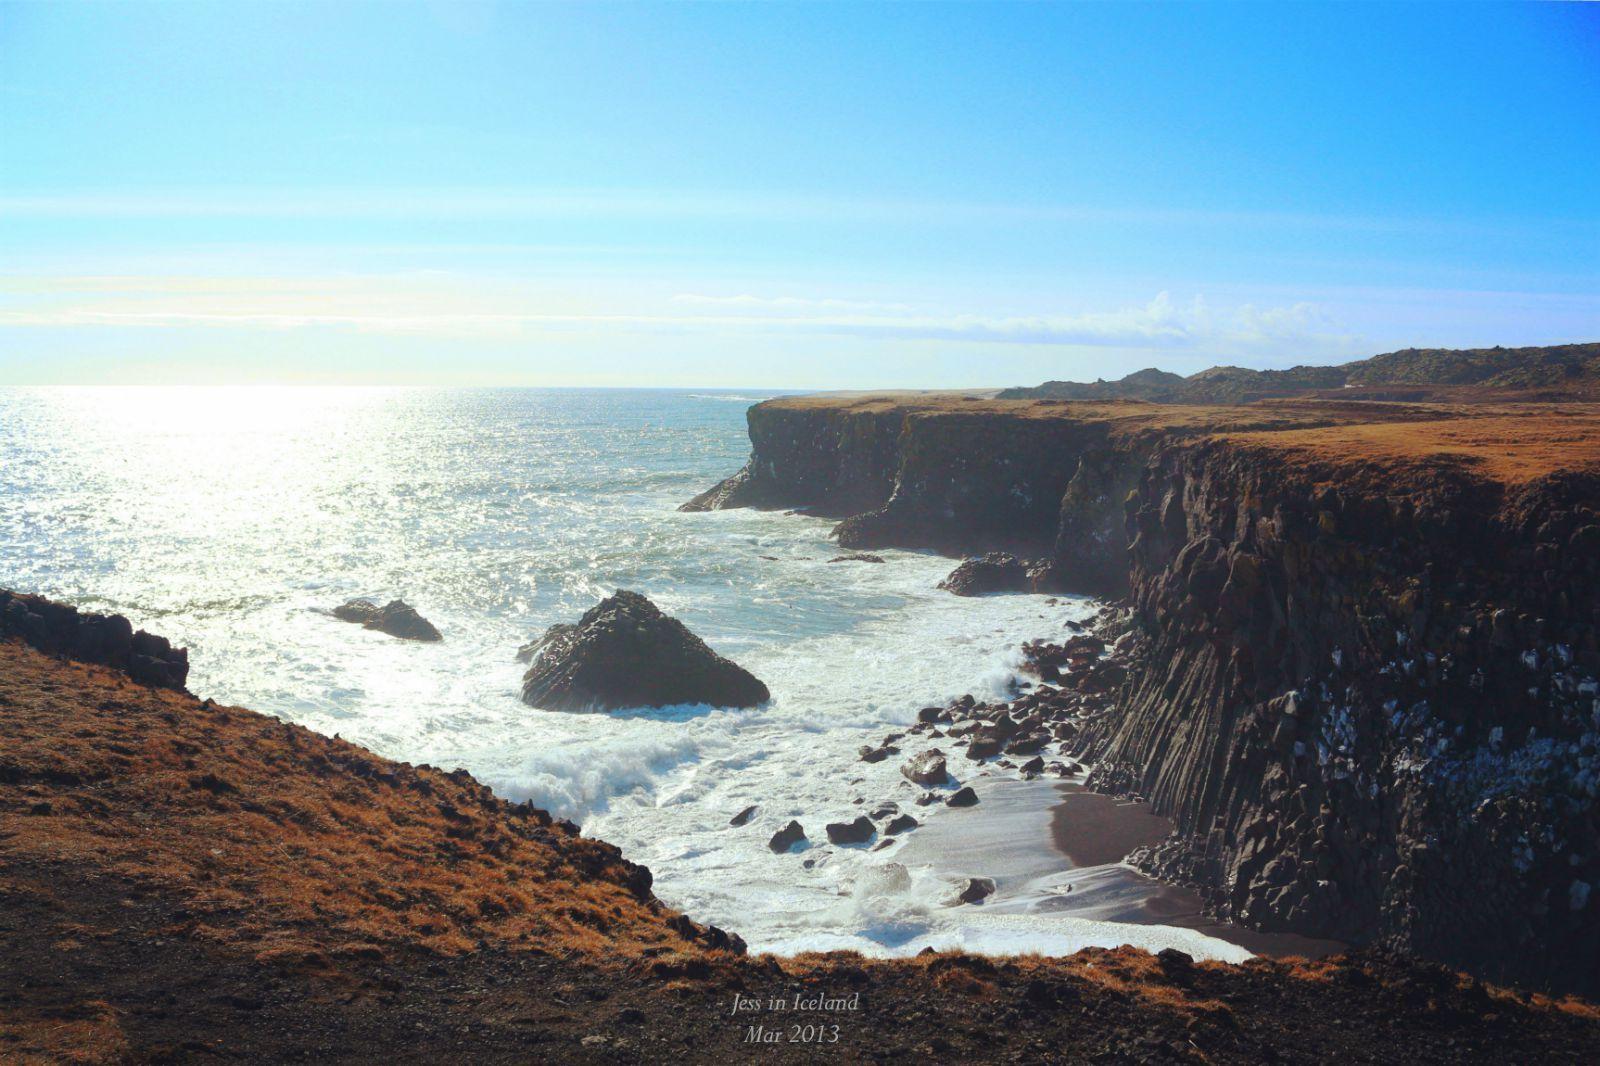 mohe_【我是达人】norse saga·冰岛神话